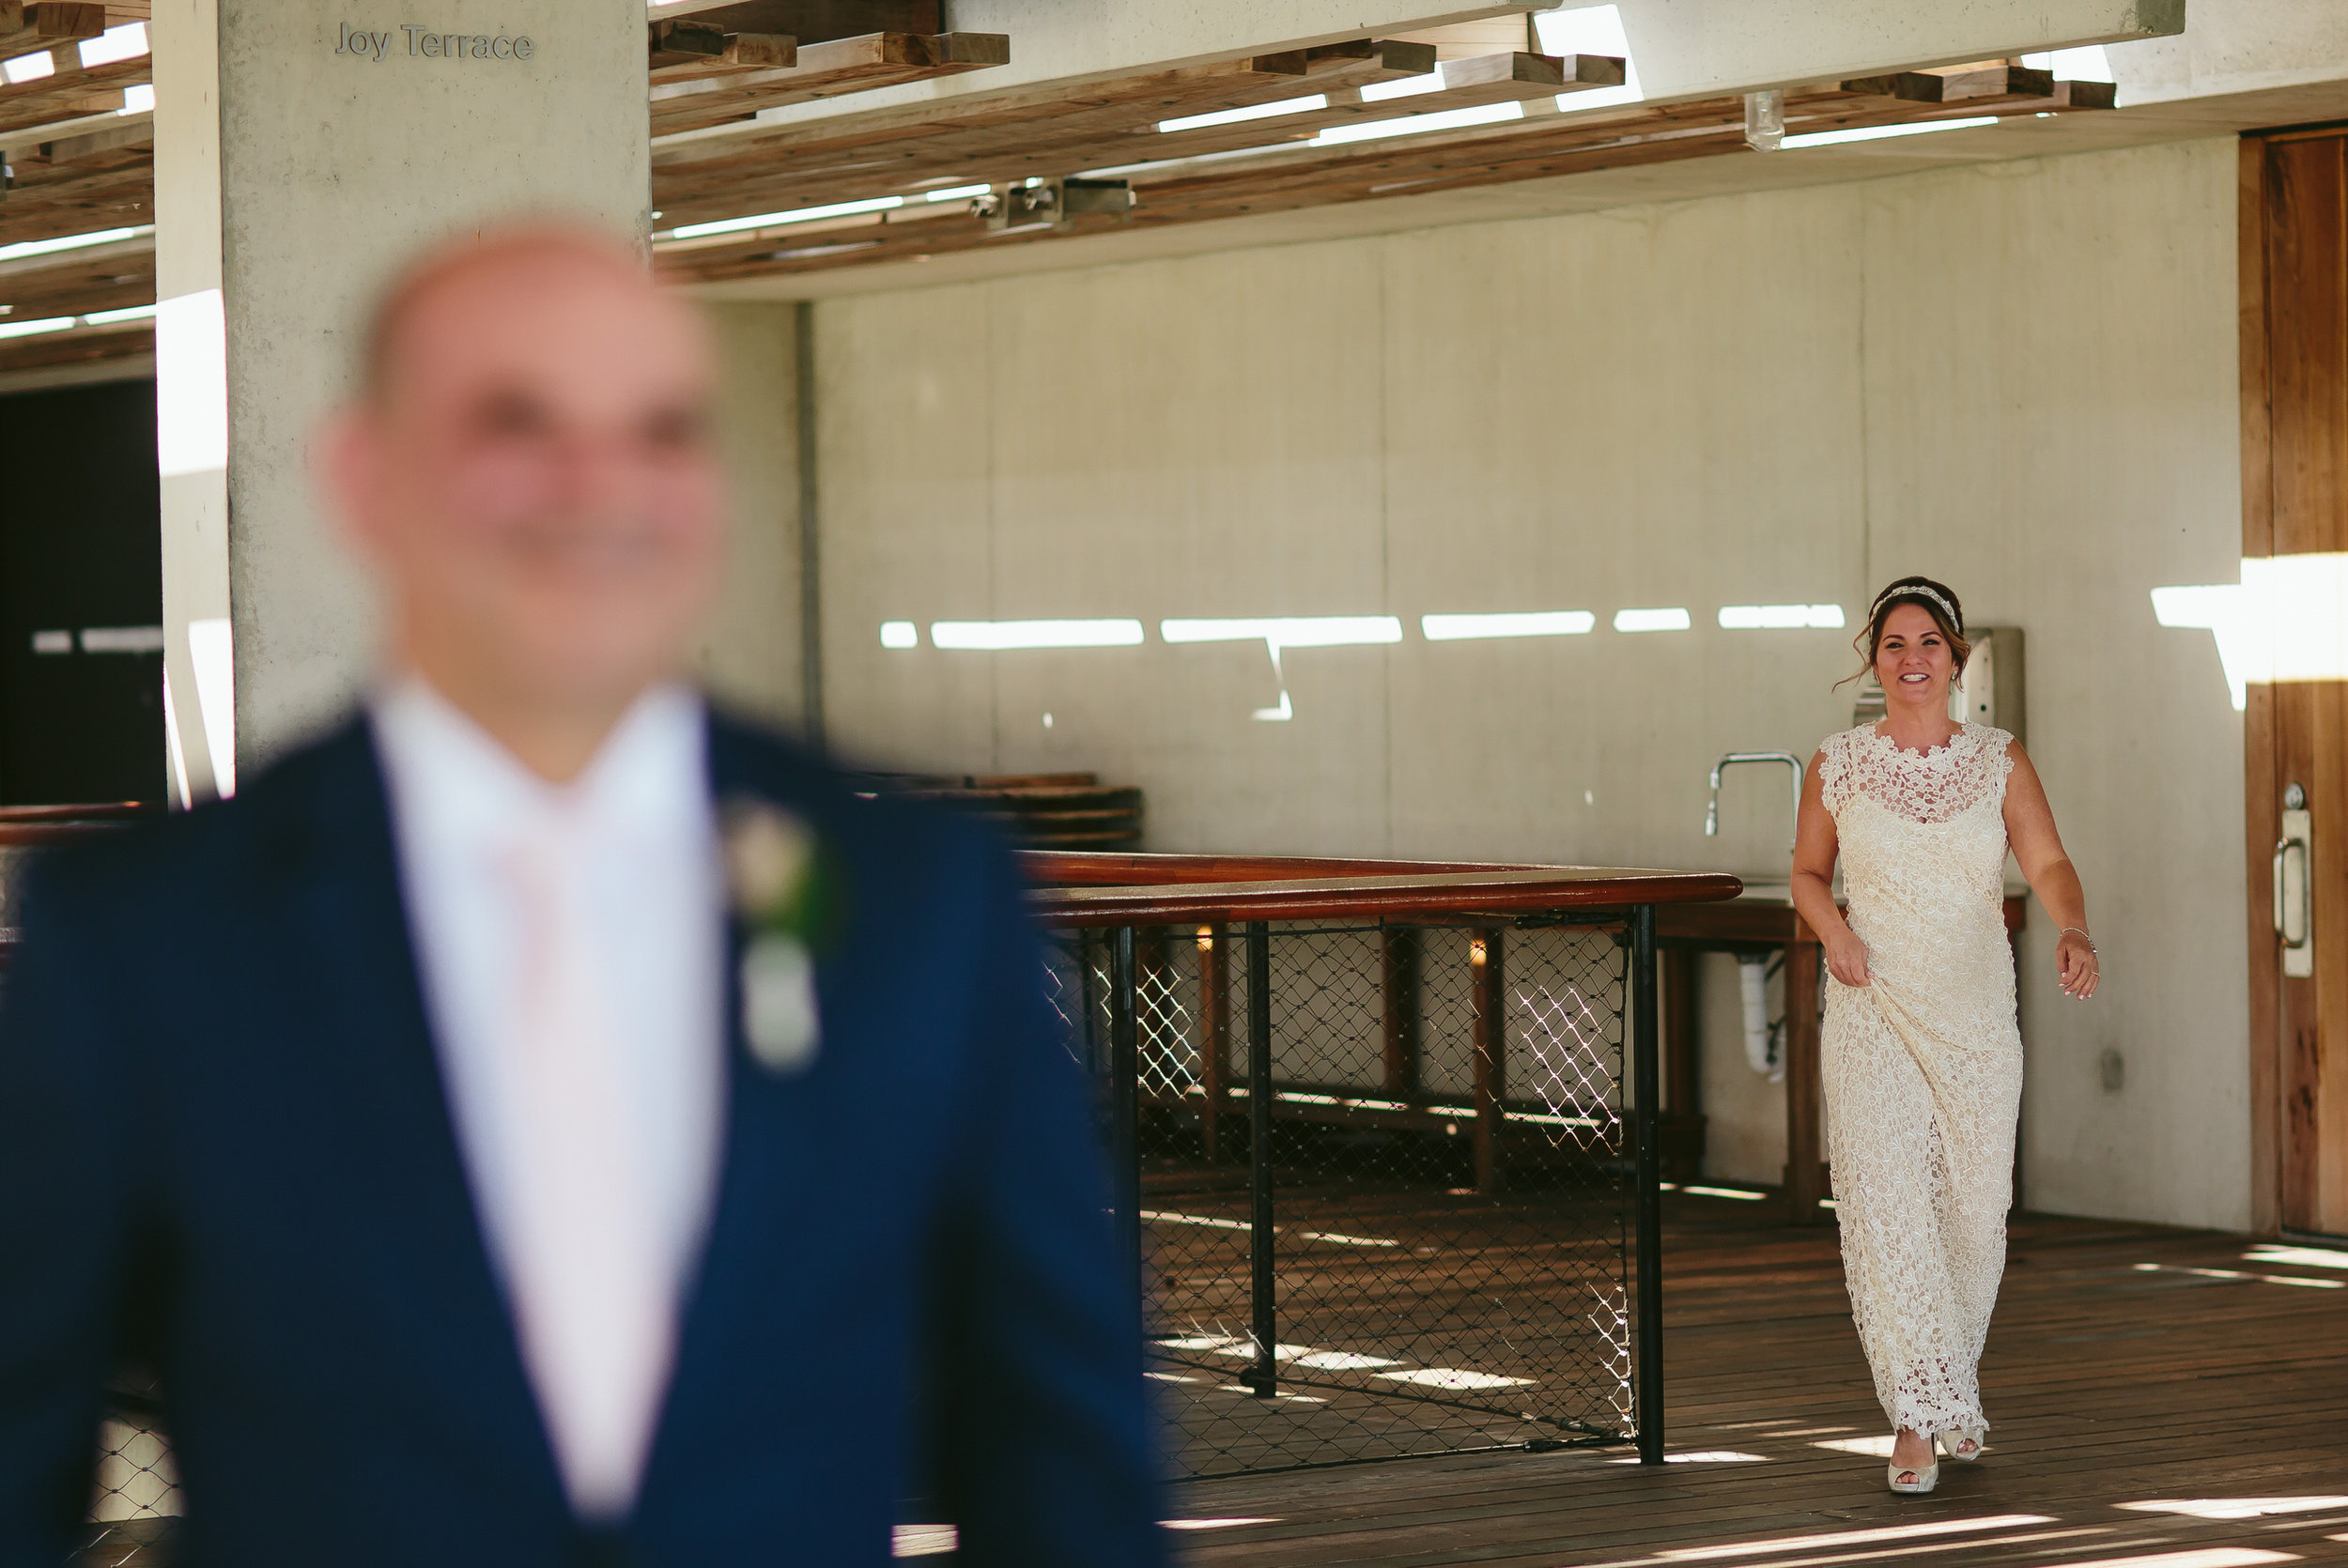 perez_art_museum_wedding_steph_lynn_photo_miami_photographer_first_look-13.jpg